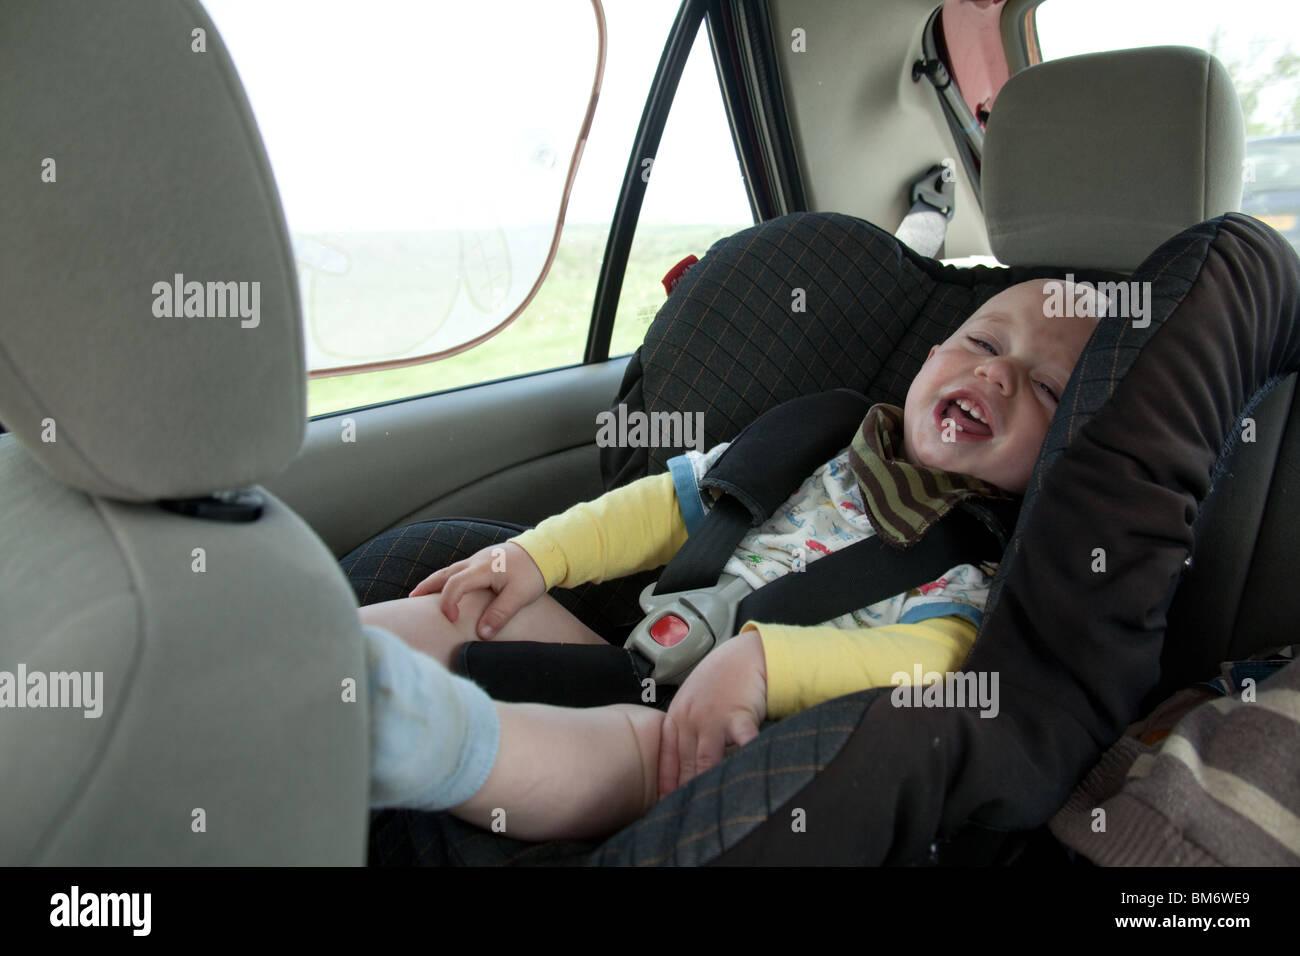 One Year Old Baby Boy In A Car Seat Hampshire England United Kingdom